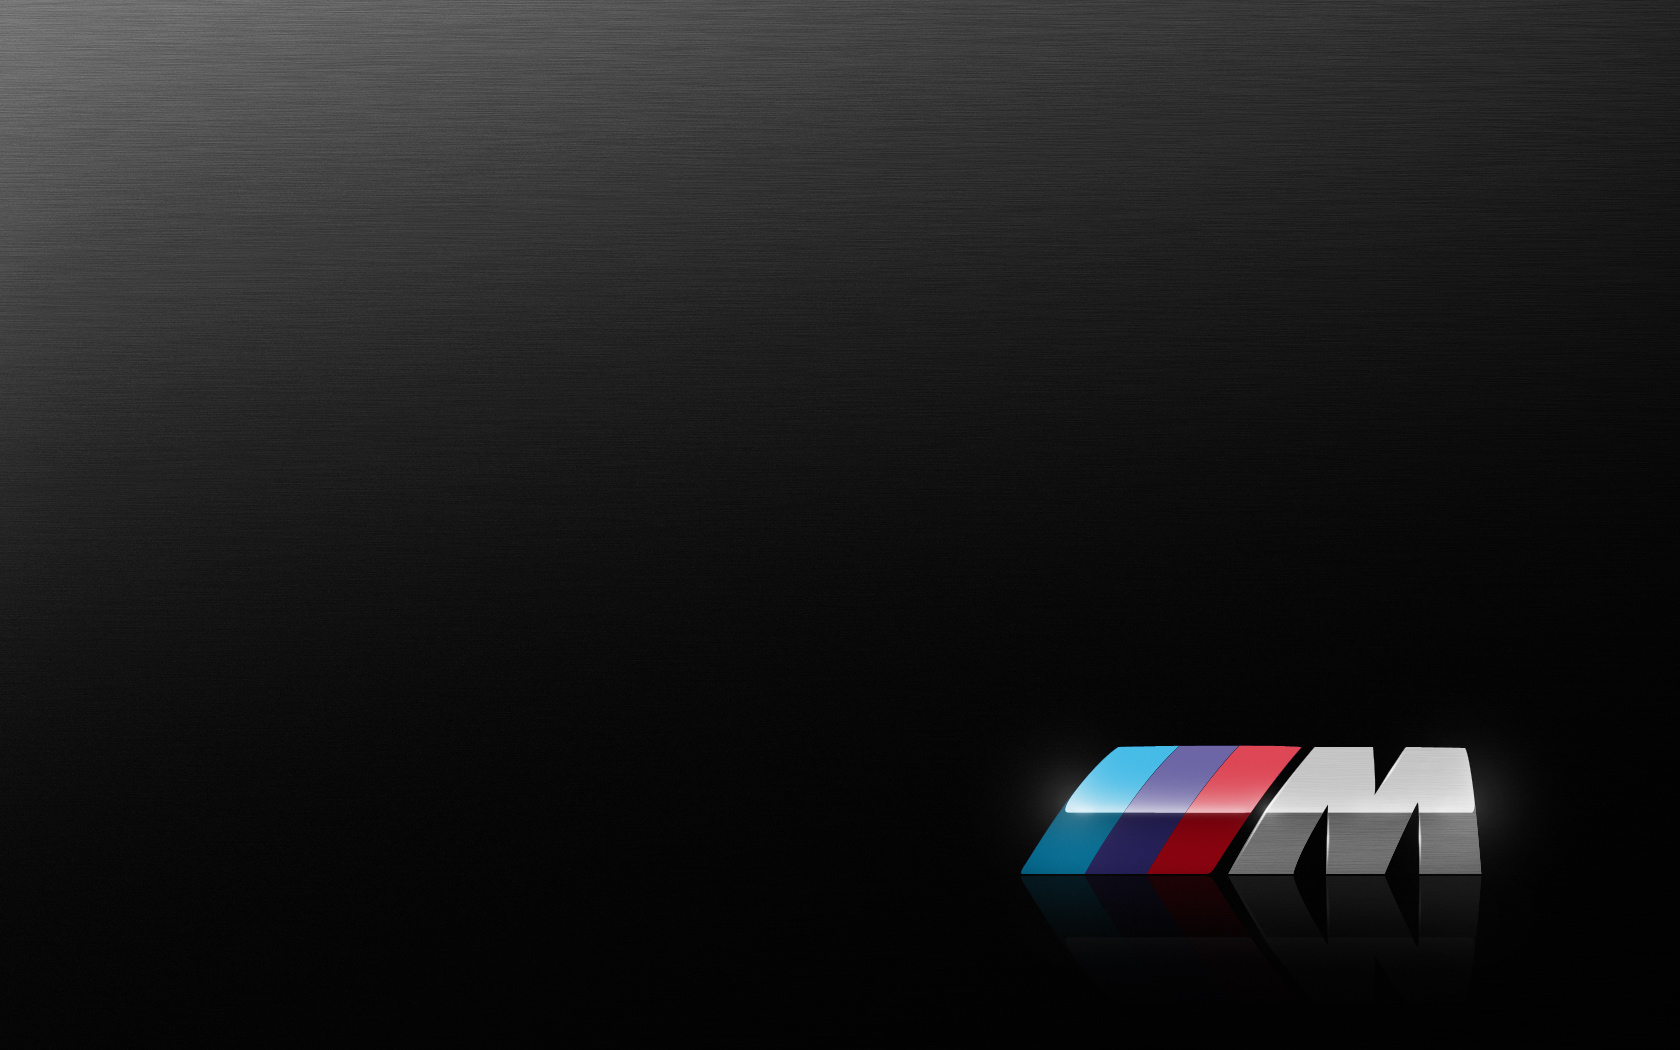 bmwbmw m logo 1680x1050